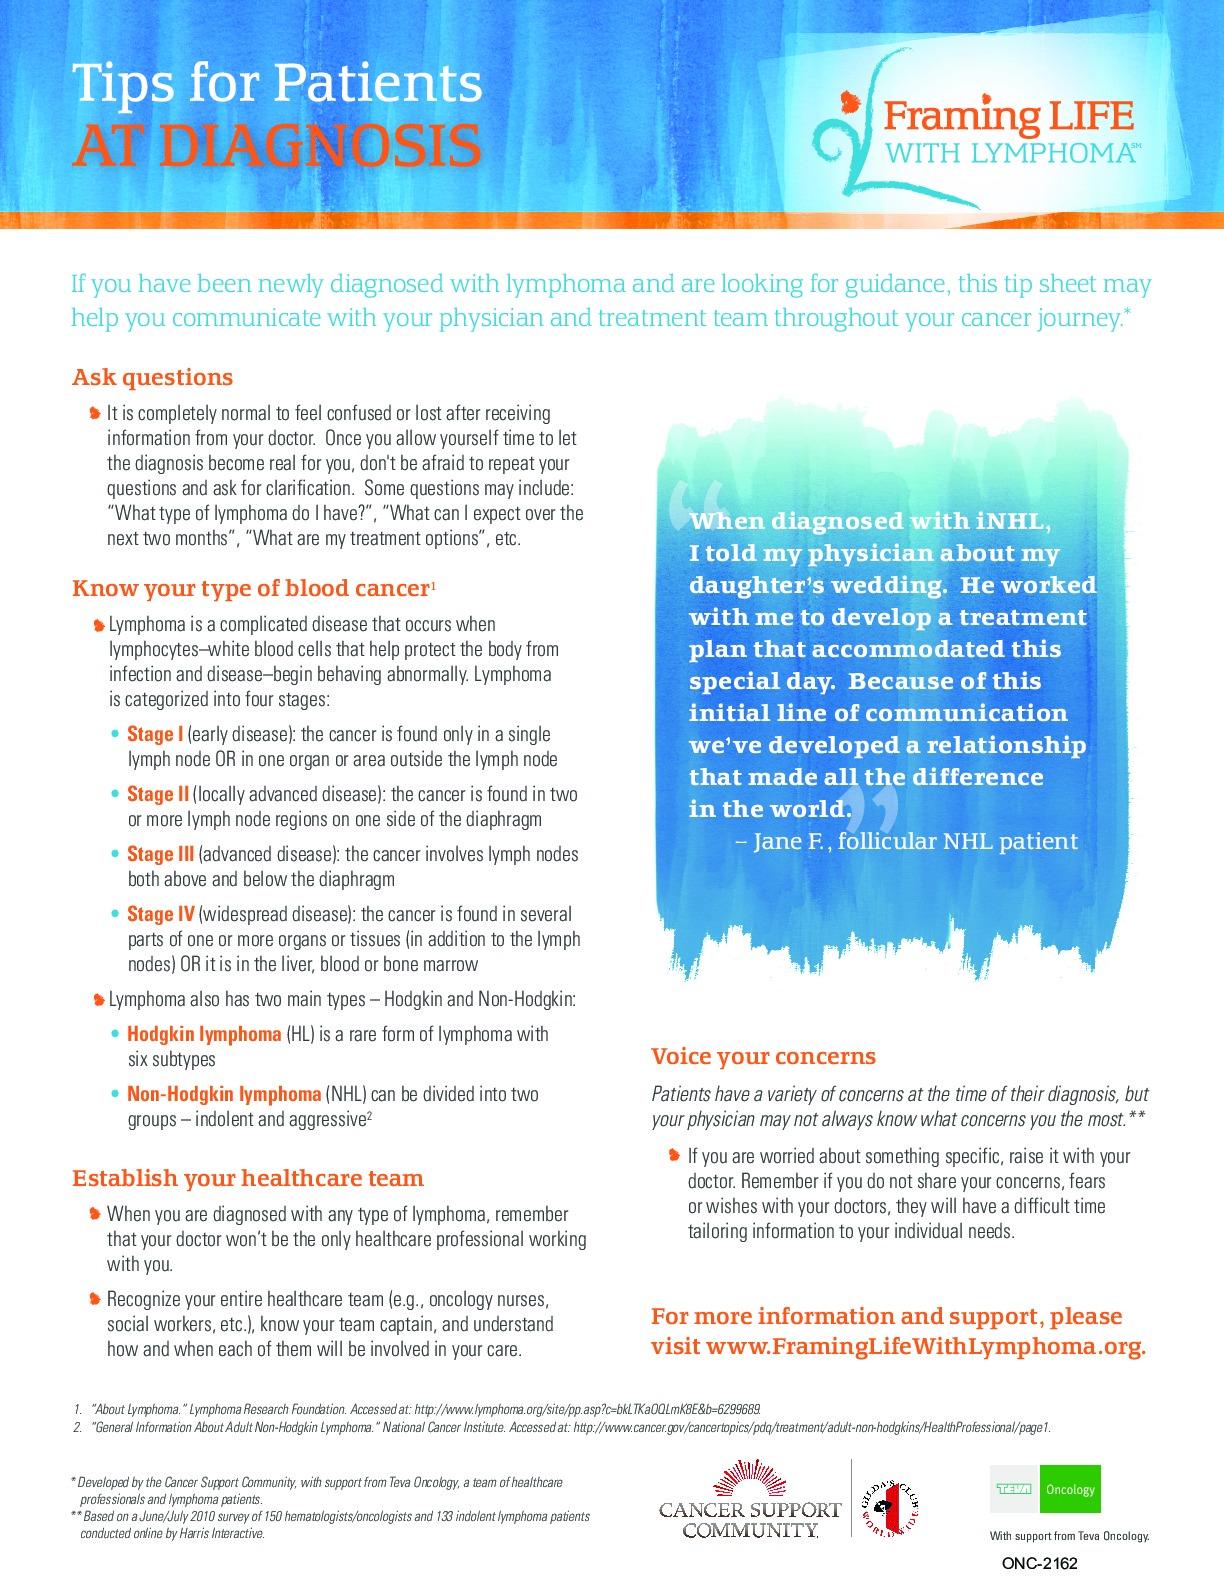 Tips for Patients at Diagnosis (Lymphoma)